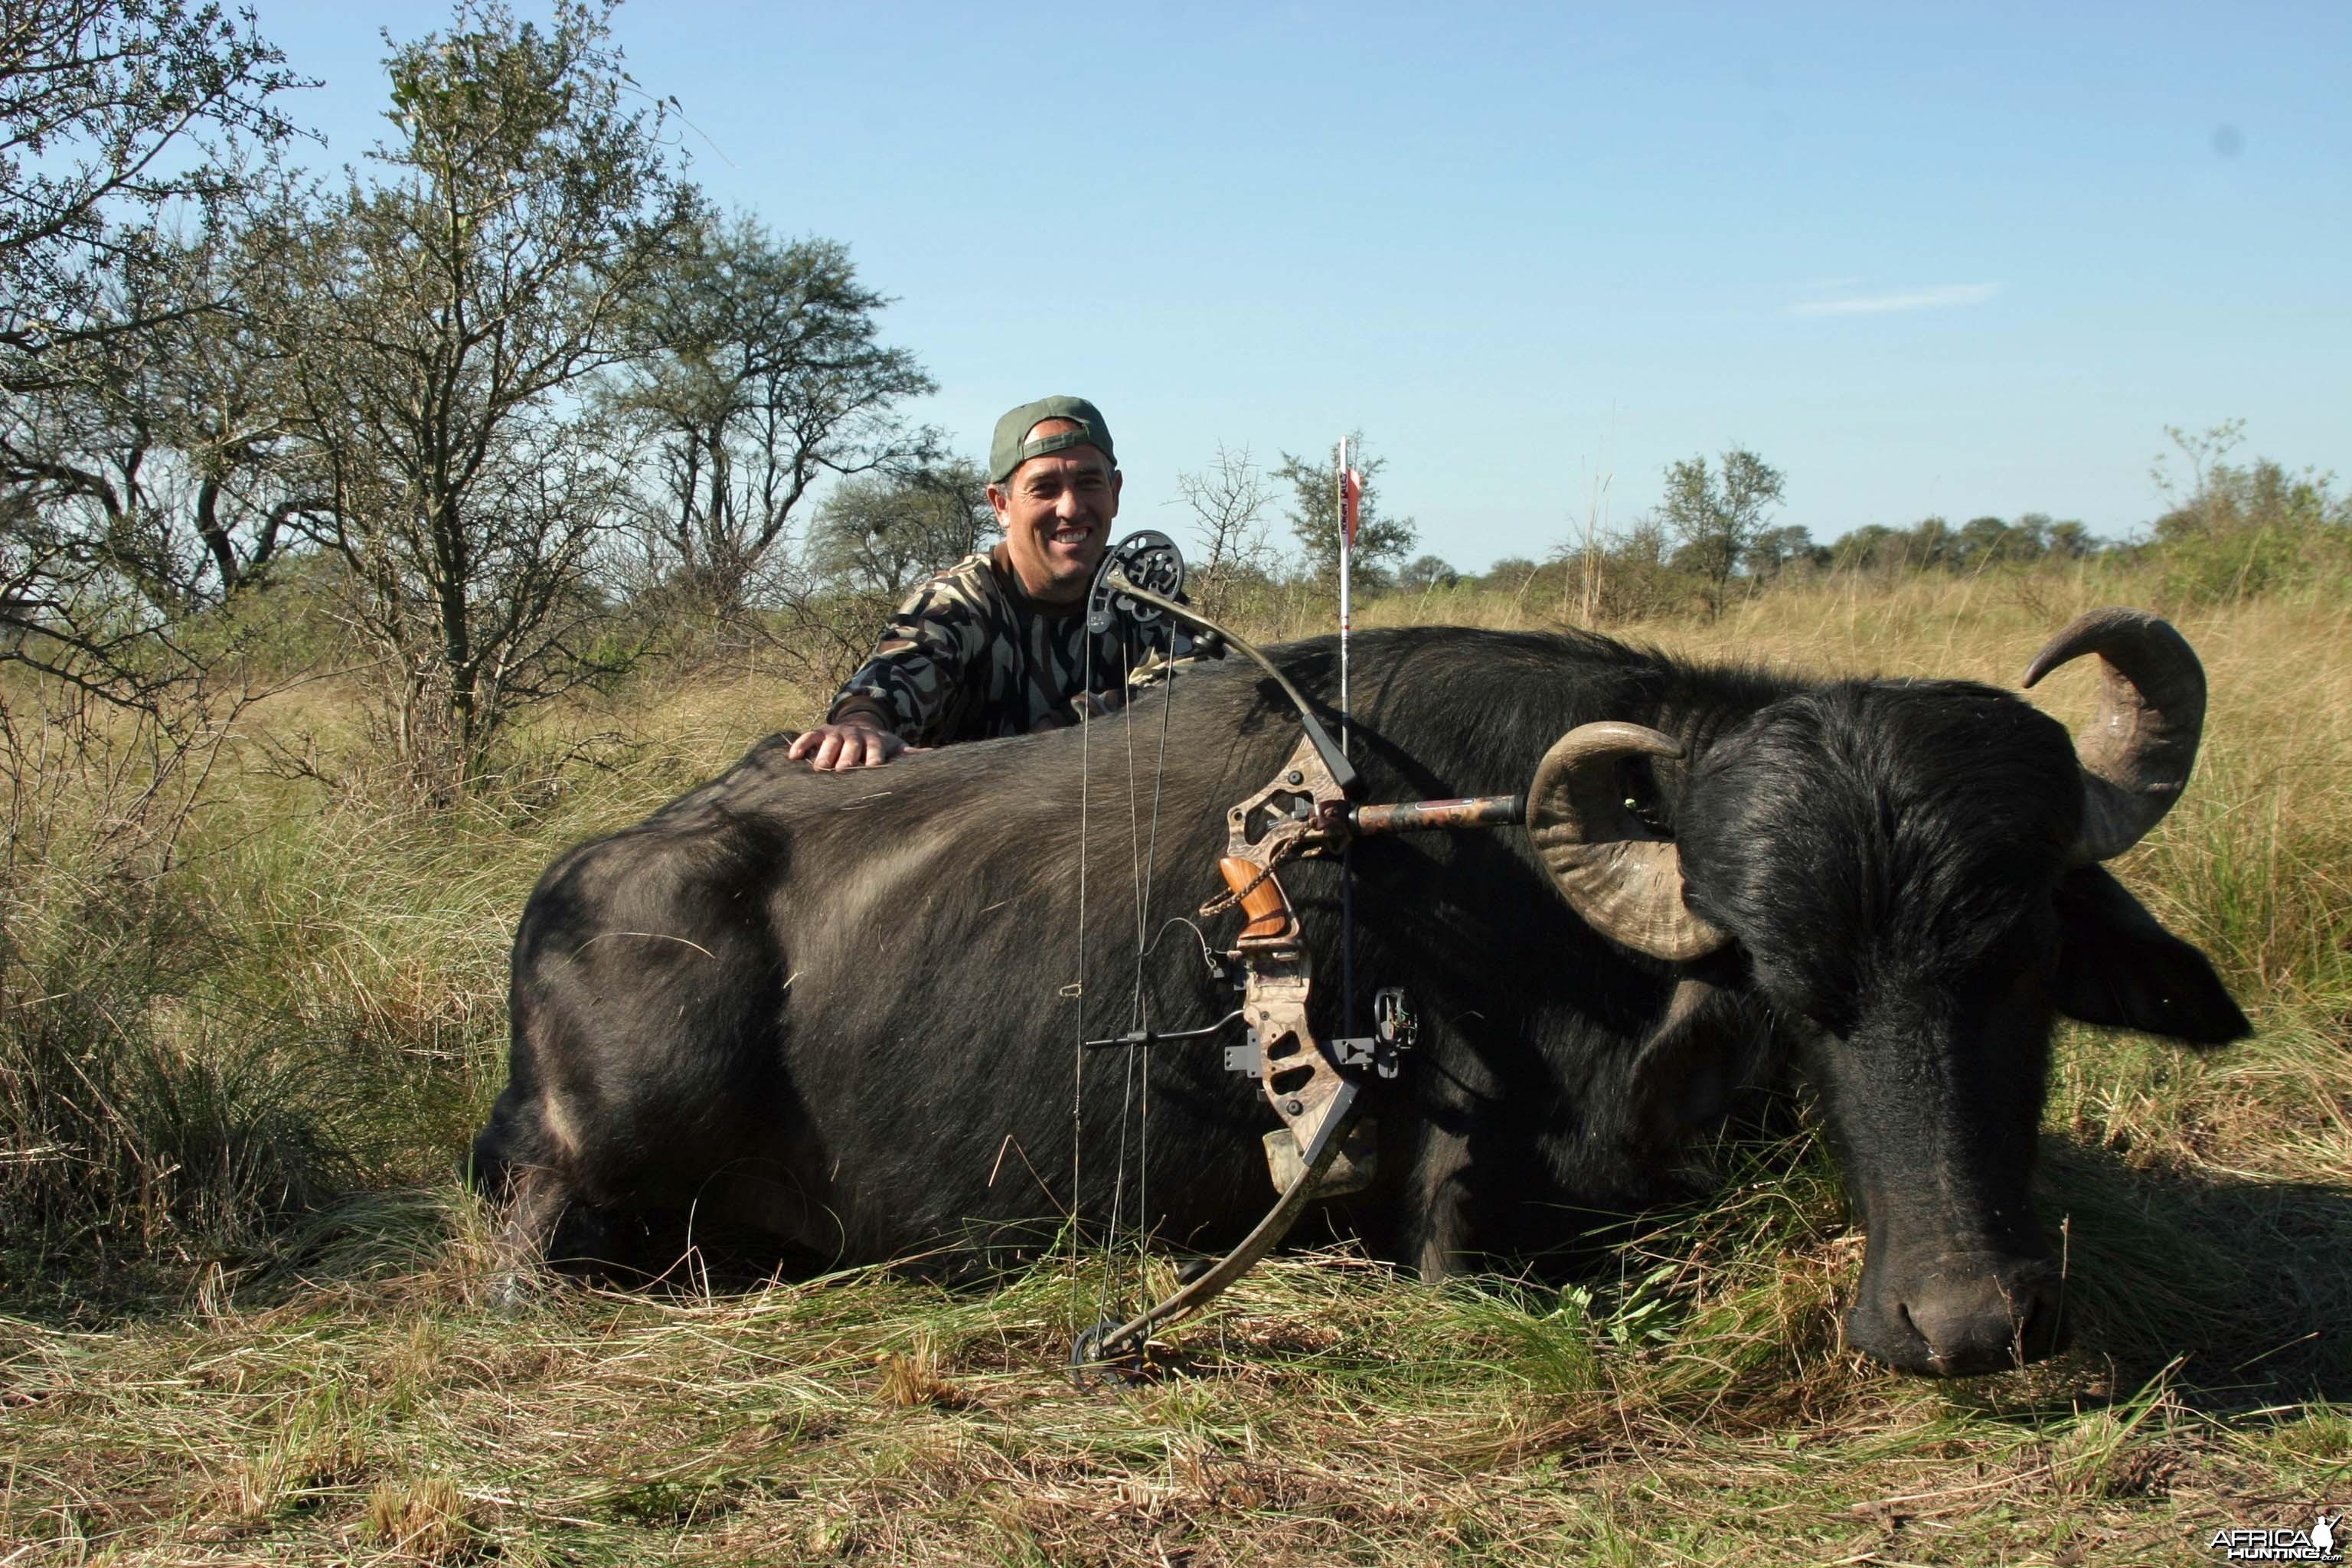 Water Buffalo-Argentina